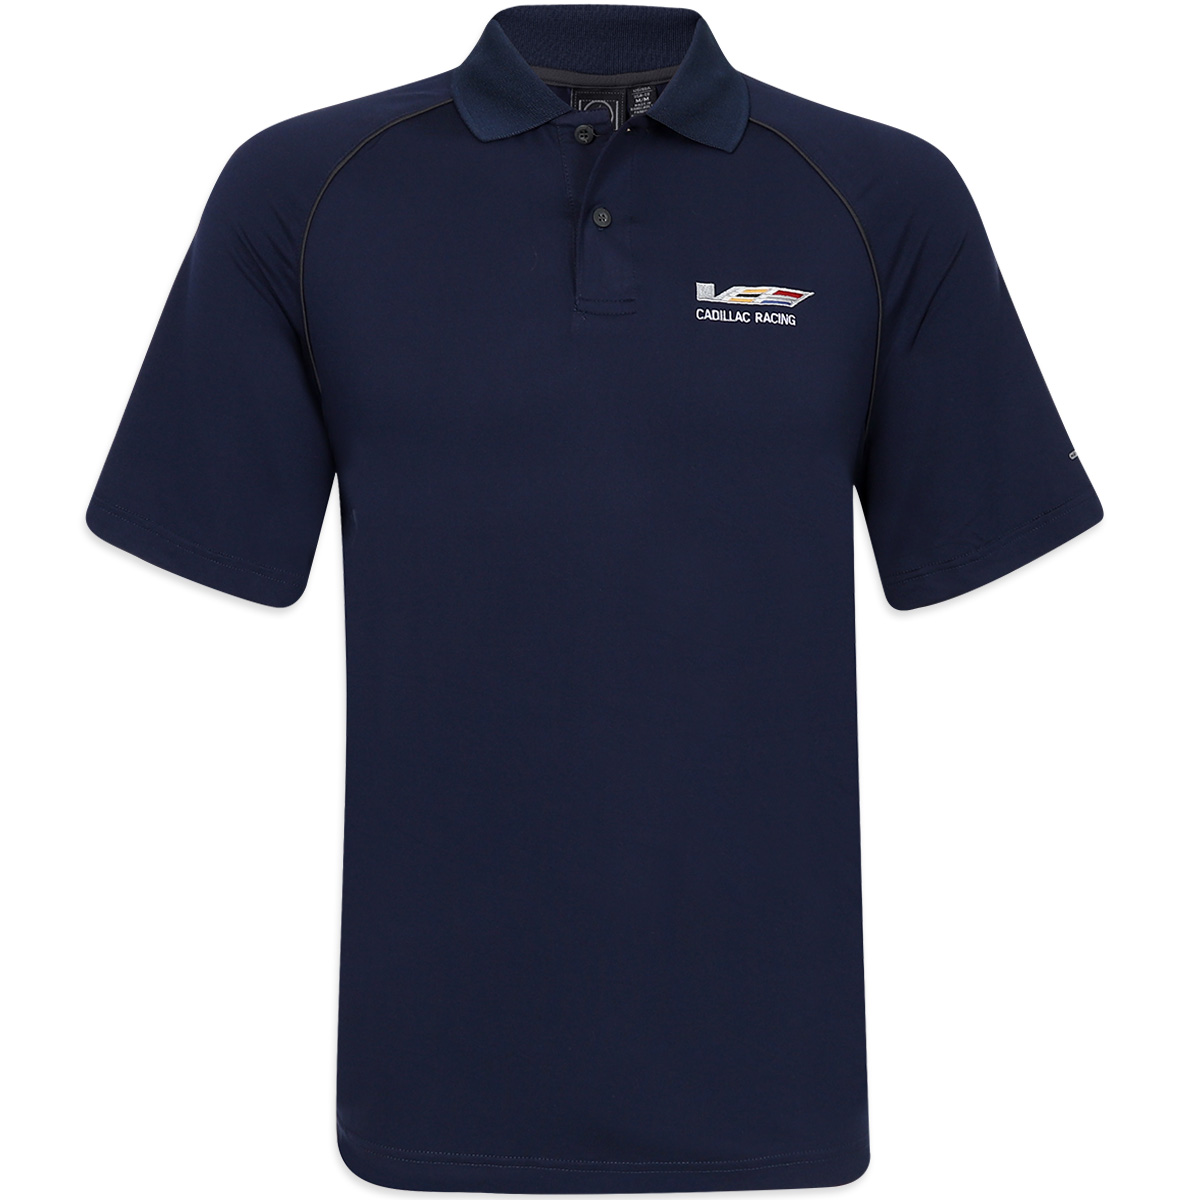 Details about  /JDC Motorsports Cadillac Racing Polo Performance IMSA Team Shirt Size M Black